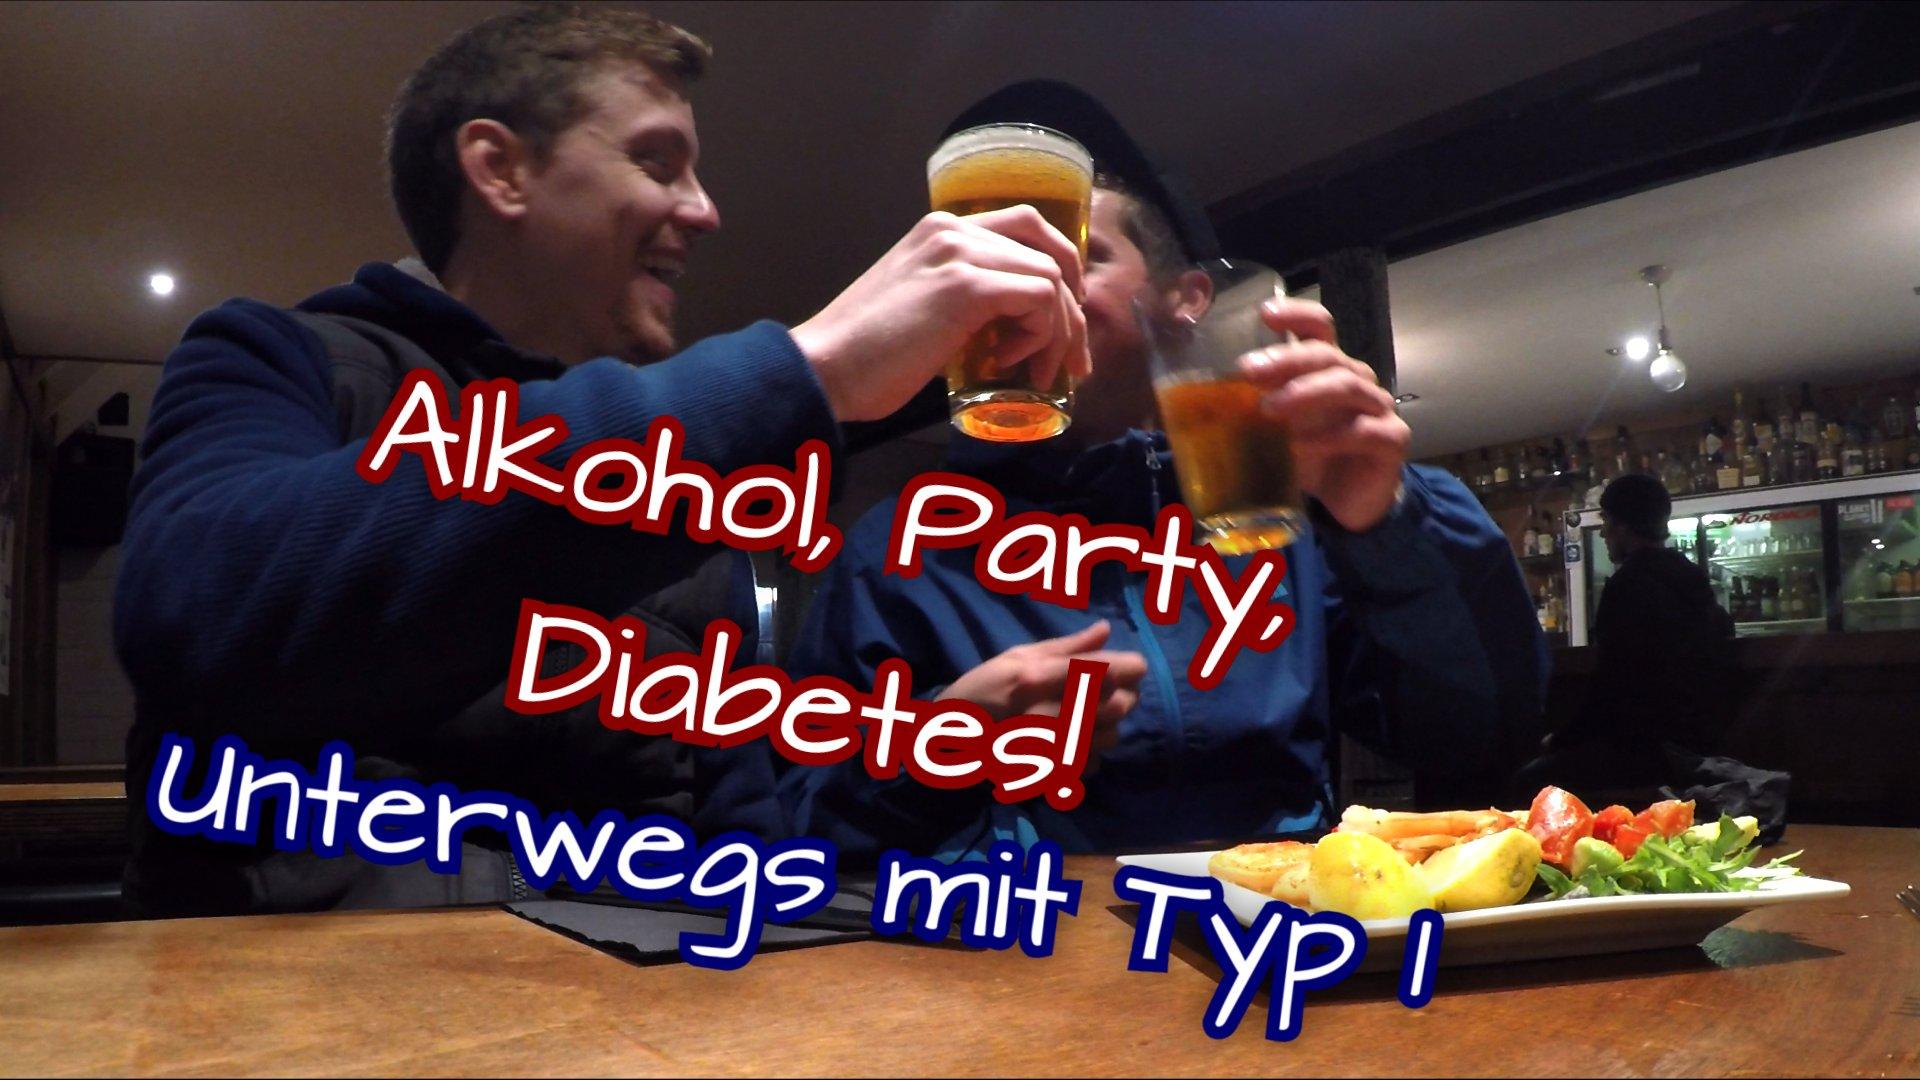 Diabetes Typ 1 Alkohol